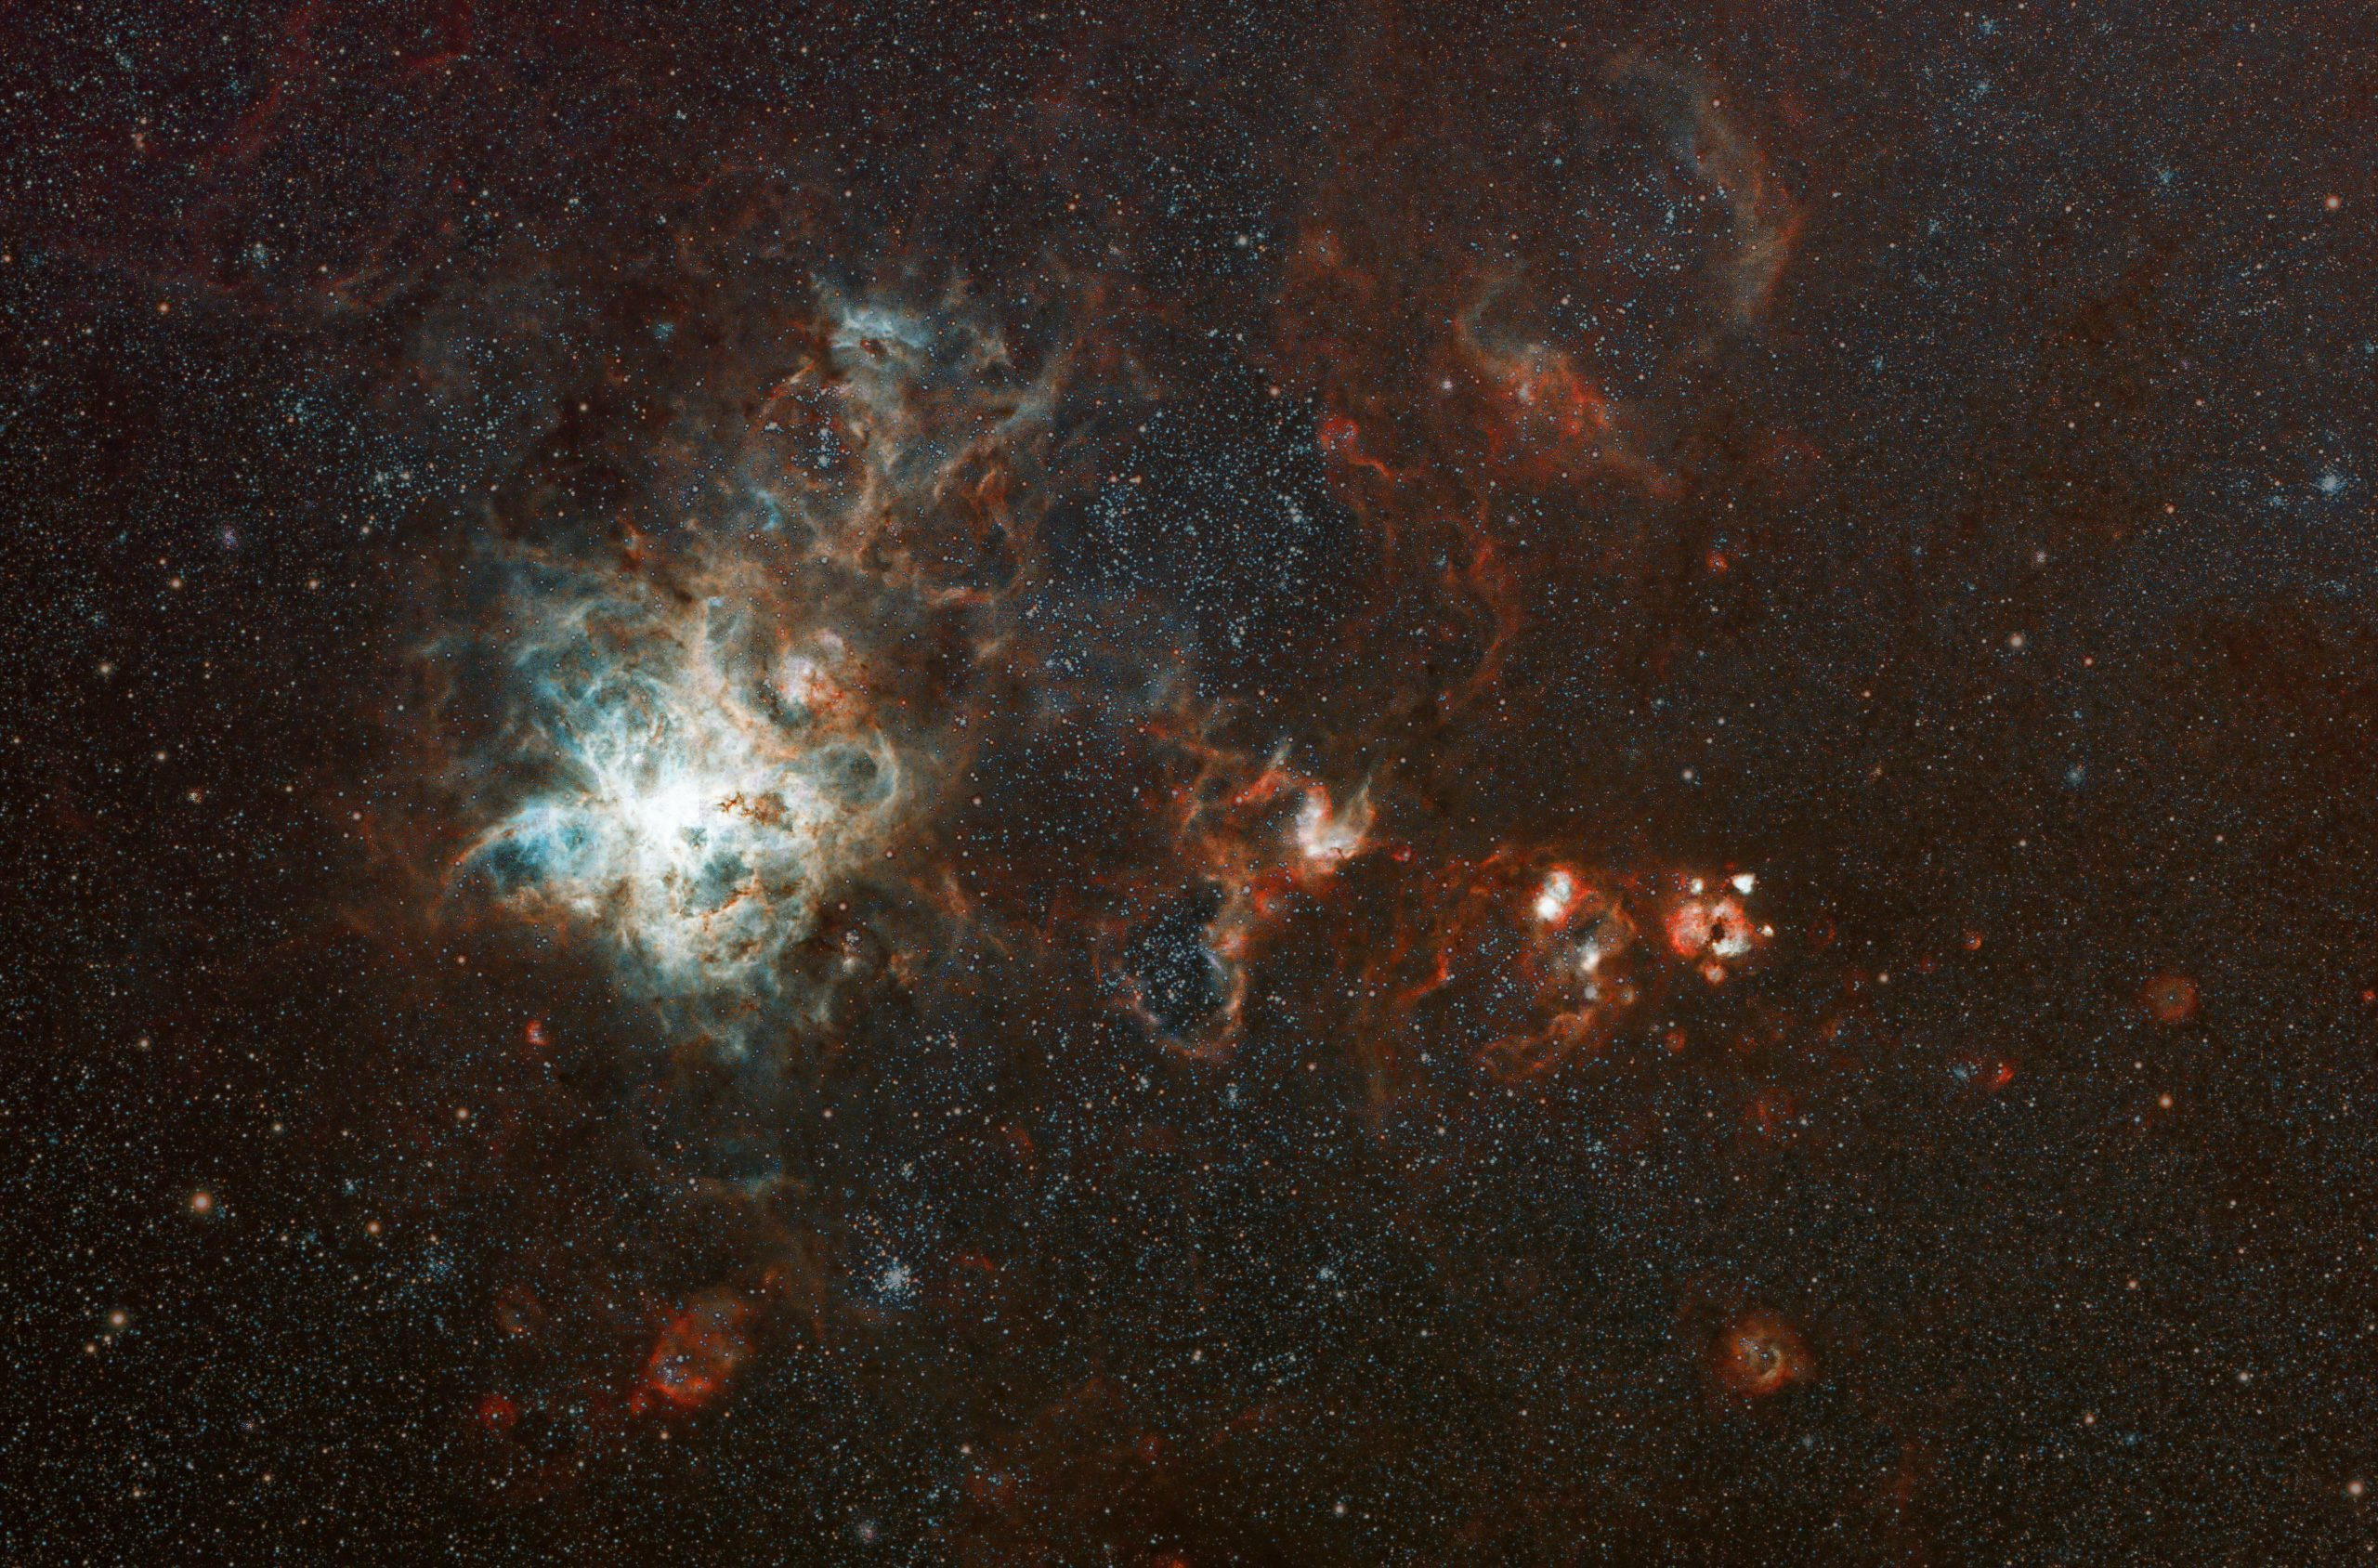 Tarantula-NGC270-Final-starsReduced